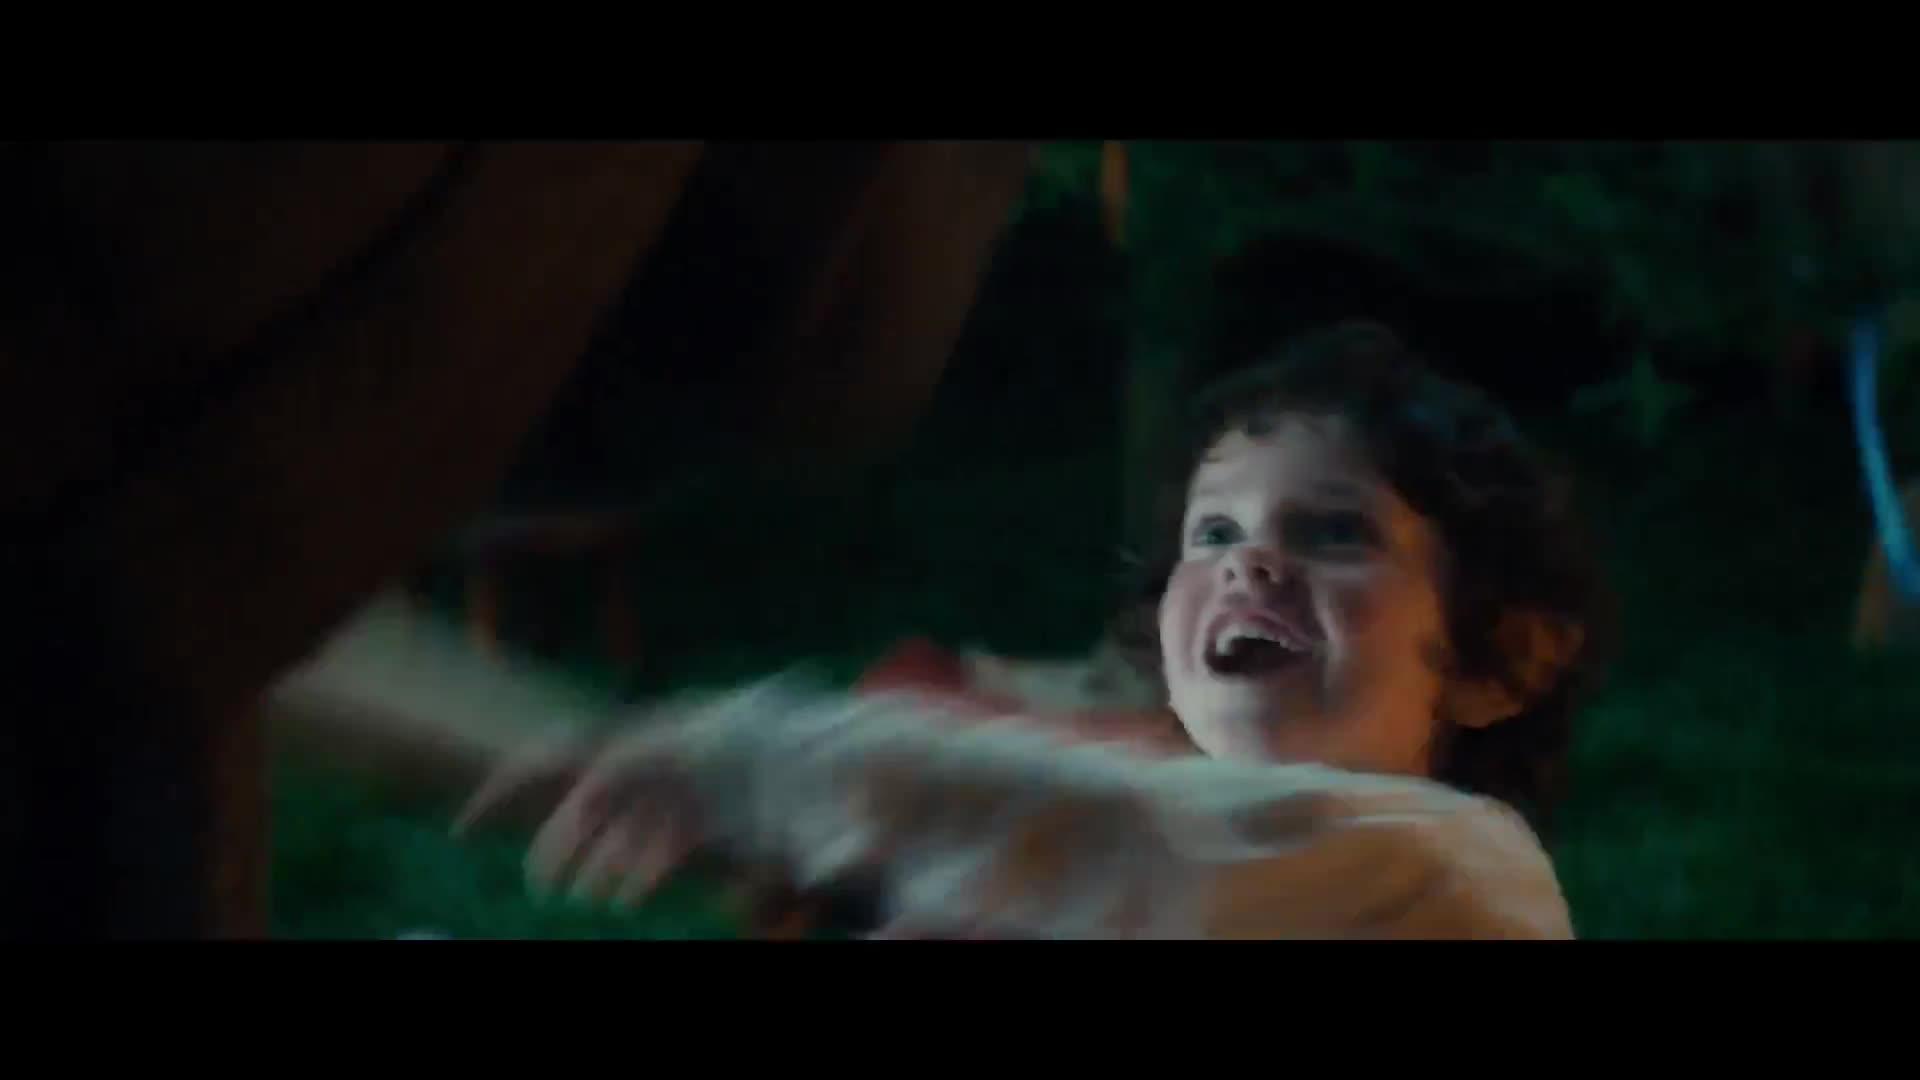 The Hobbit 1 เดอะ ฮอบบิท 1 การผจญภัยสุดคาดคิด (2012)